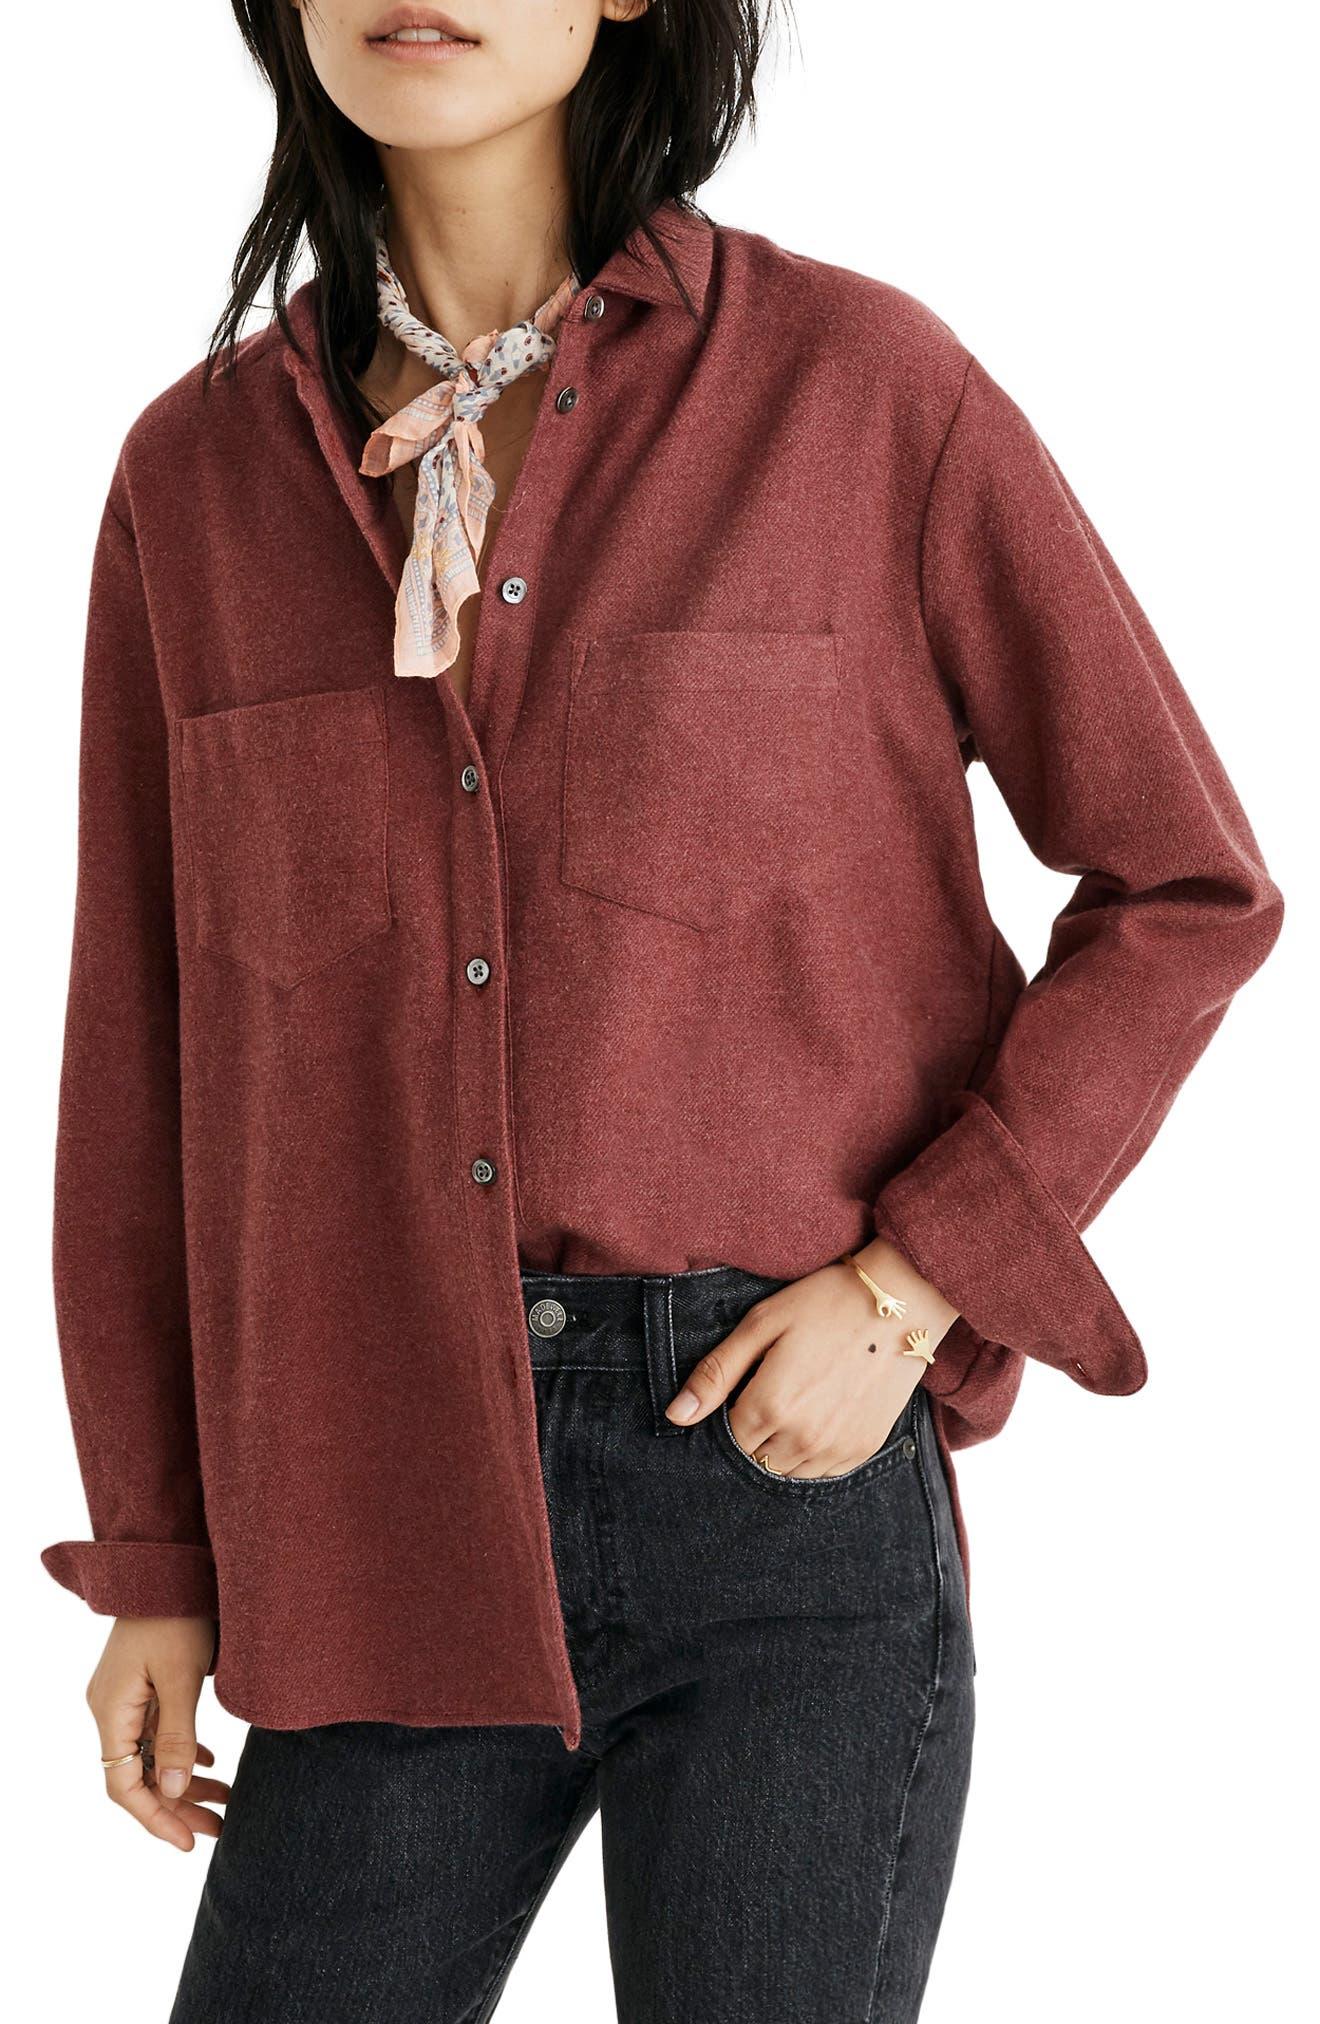 MADEWELL Flannel Sunday Shirt, Main, color, 600